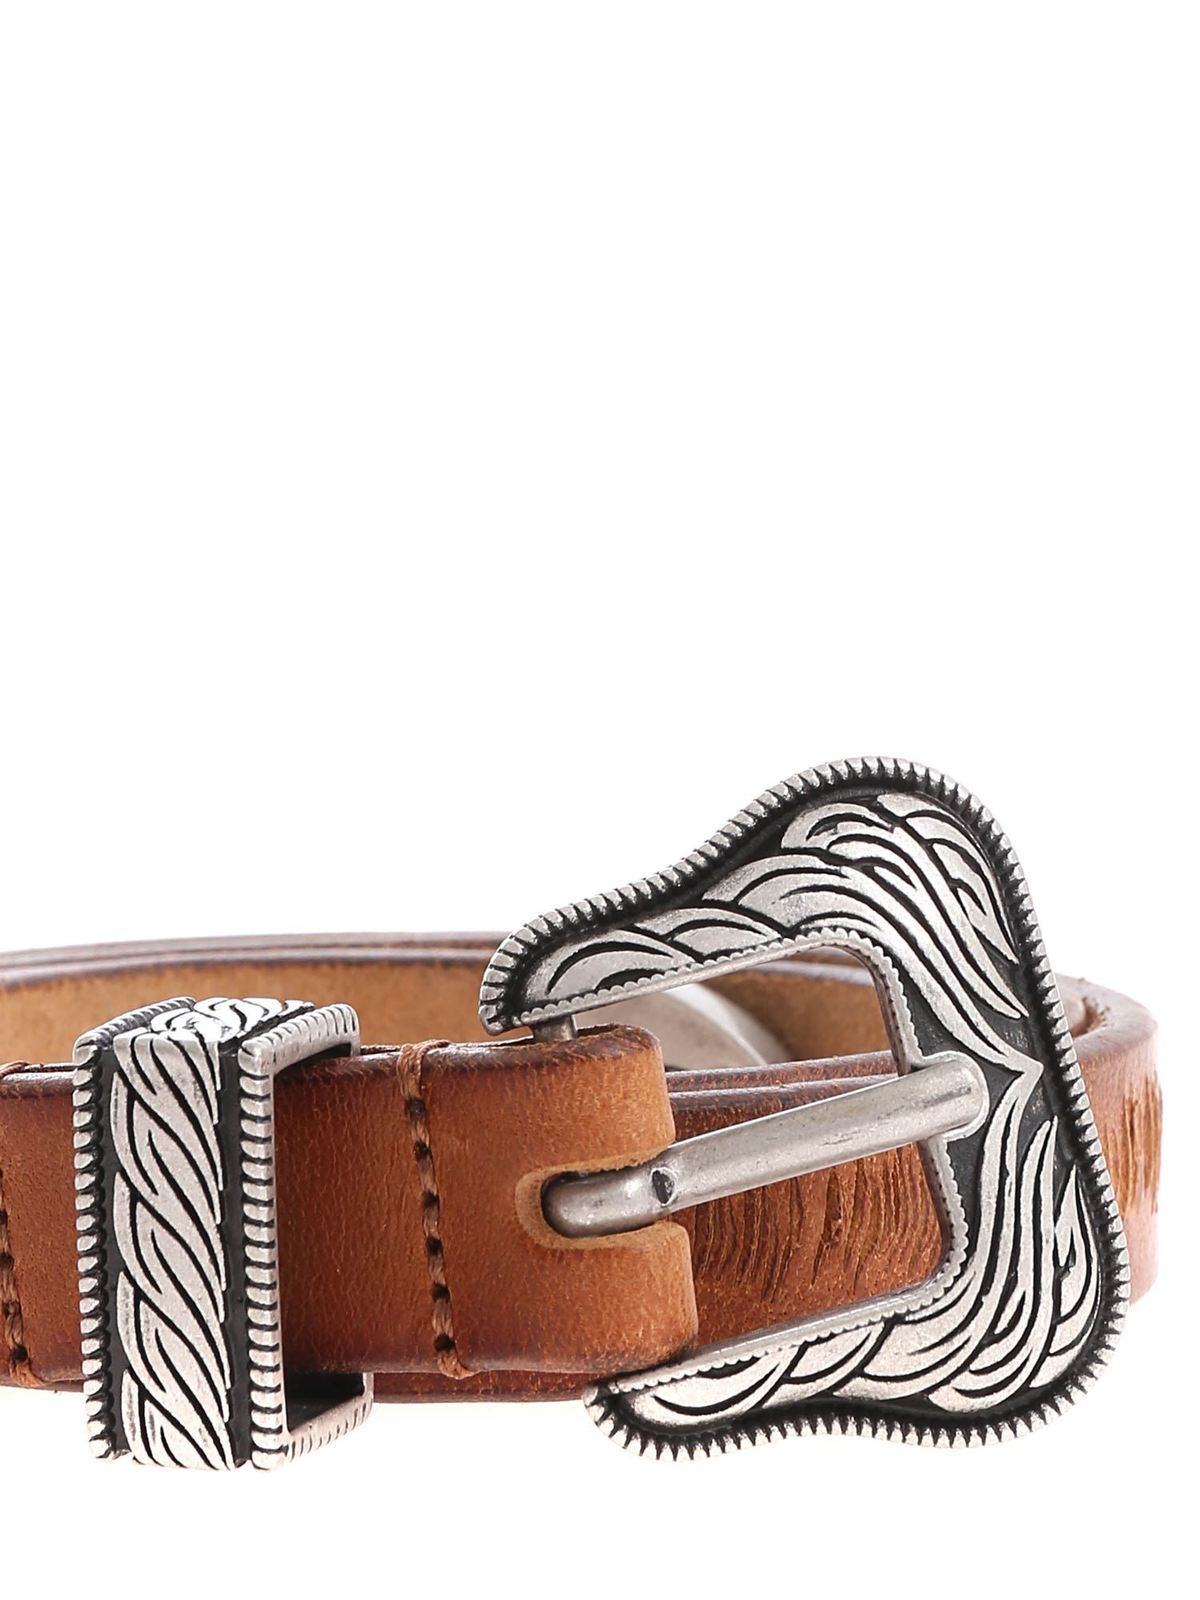 l'atteggiamento migliore 4cf8c 2f8c9 Htc - Cintura Lamar Slim Belt color marrone cuoio - cinture ...